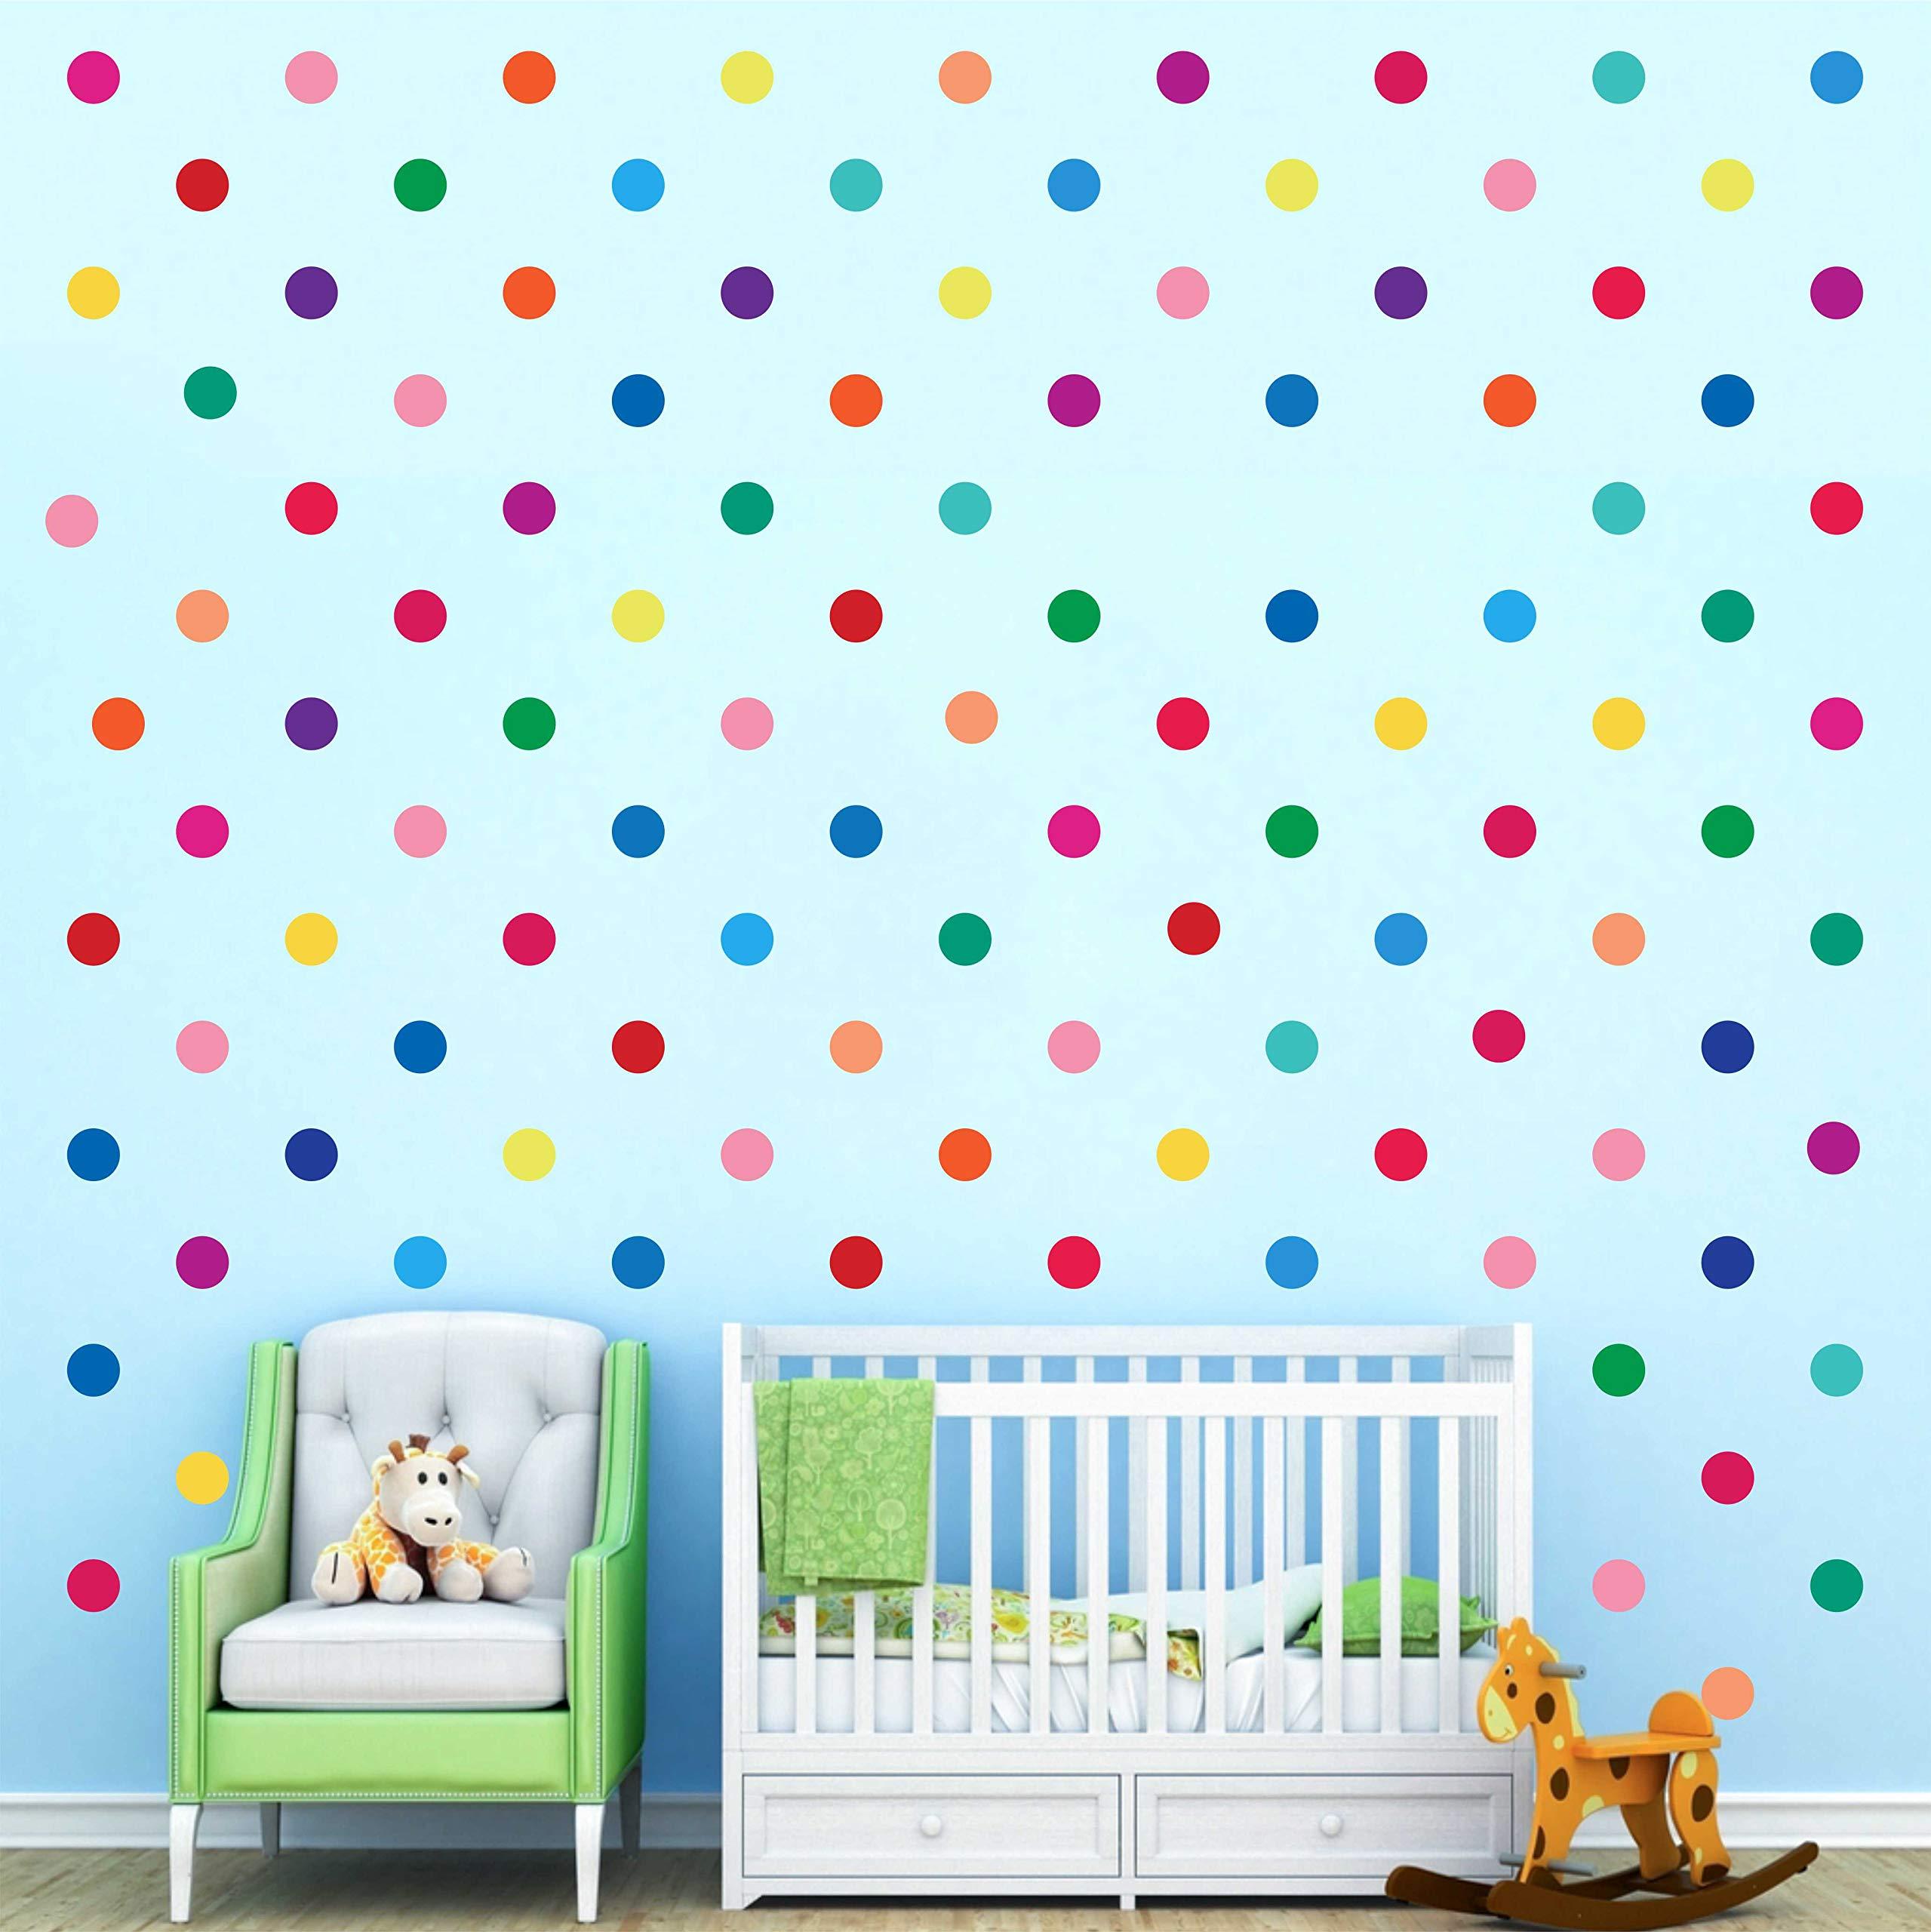 240 Decals Polka Dot Decor Rainbow Colors Polka Dot Wall Decor Circle Spot Wall Sticker Primary Colors Polka Dots Decals Kids Wall Decals Classroom Wall Decals Playroom Wall Decor